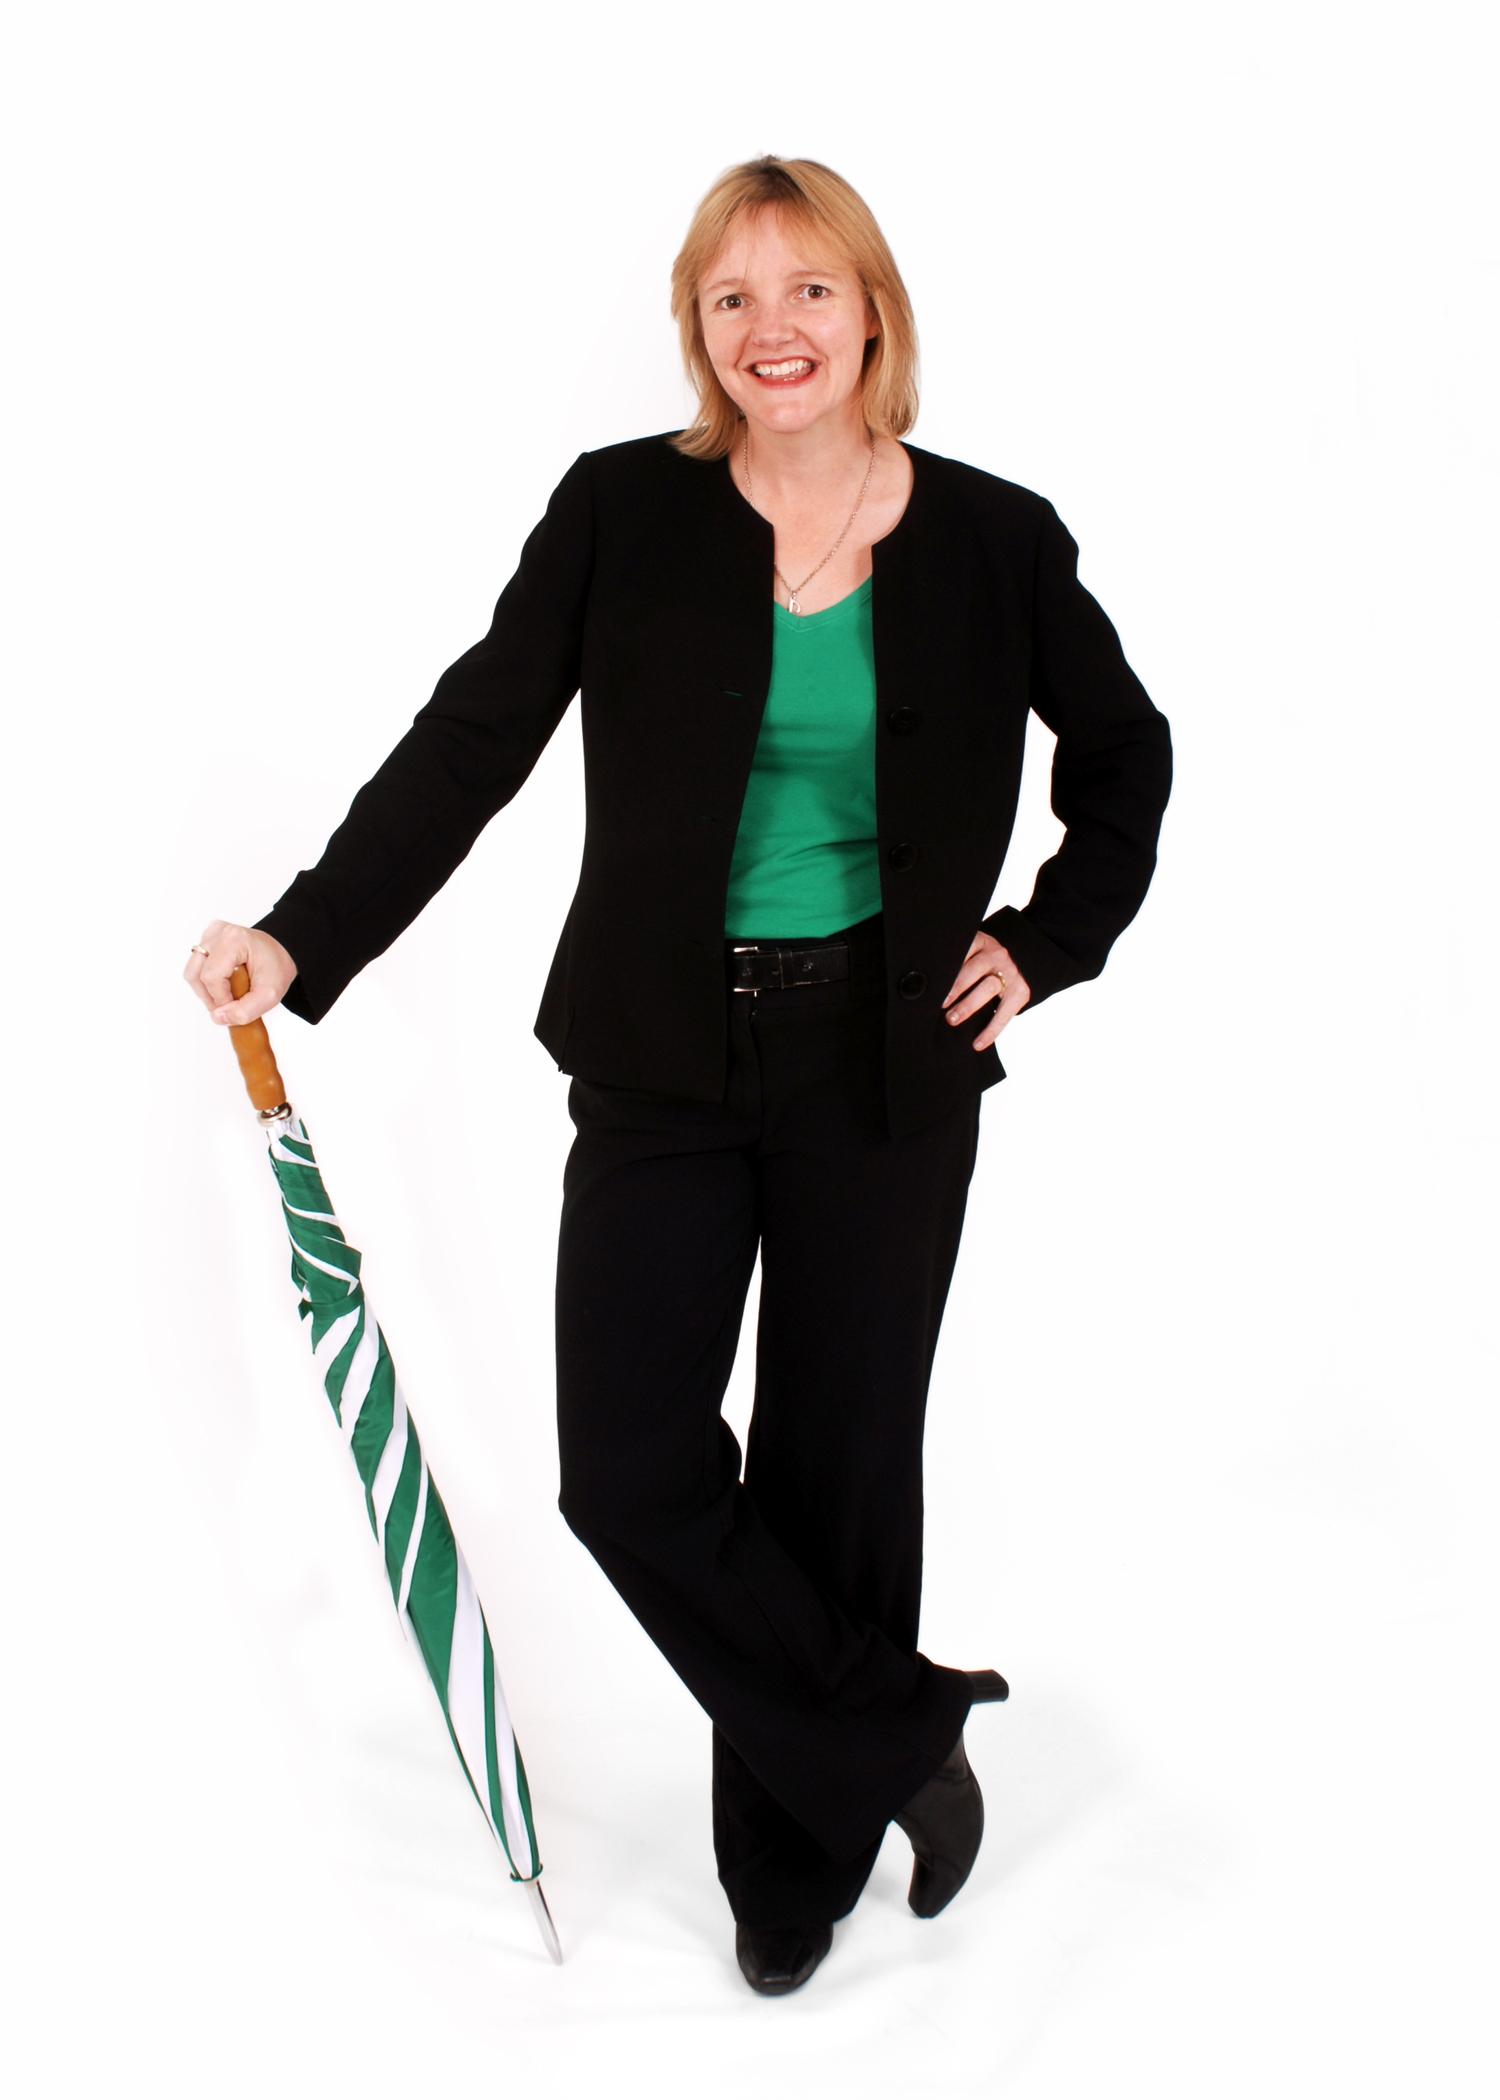 Julia Doherty Green Umbrella Social Media for Business